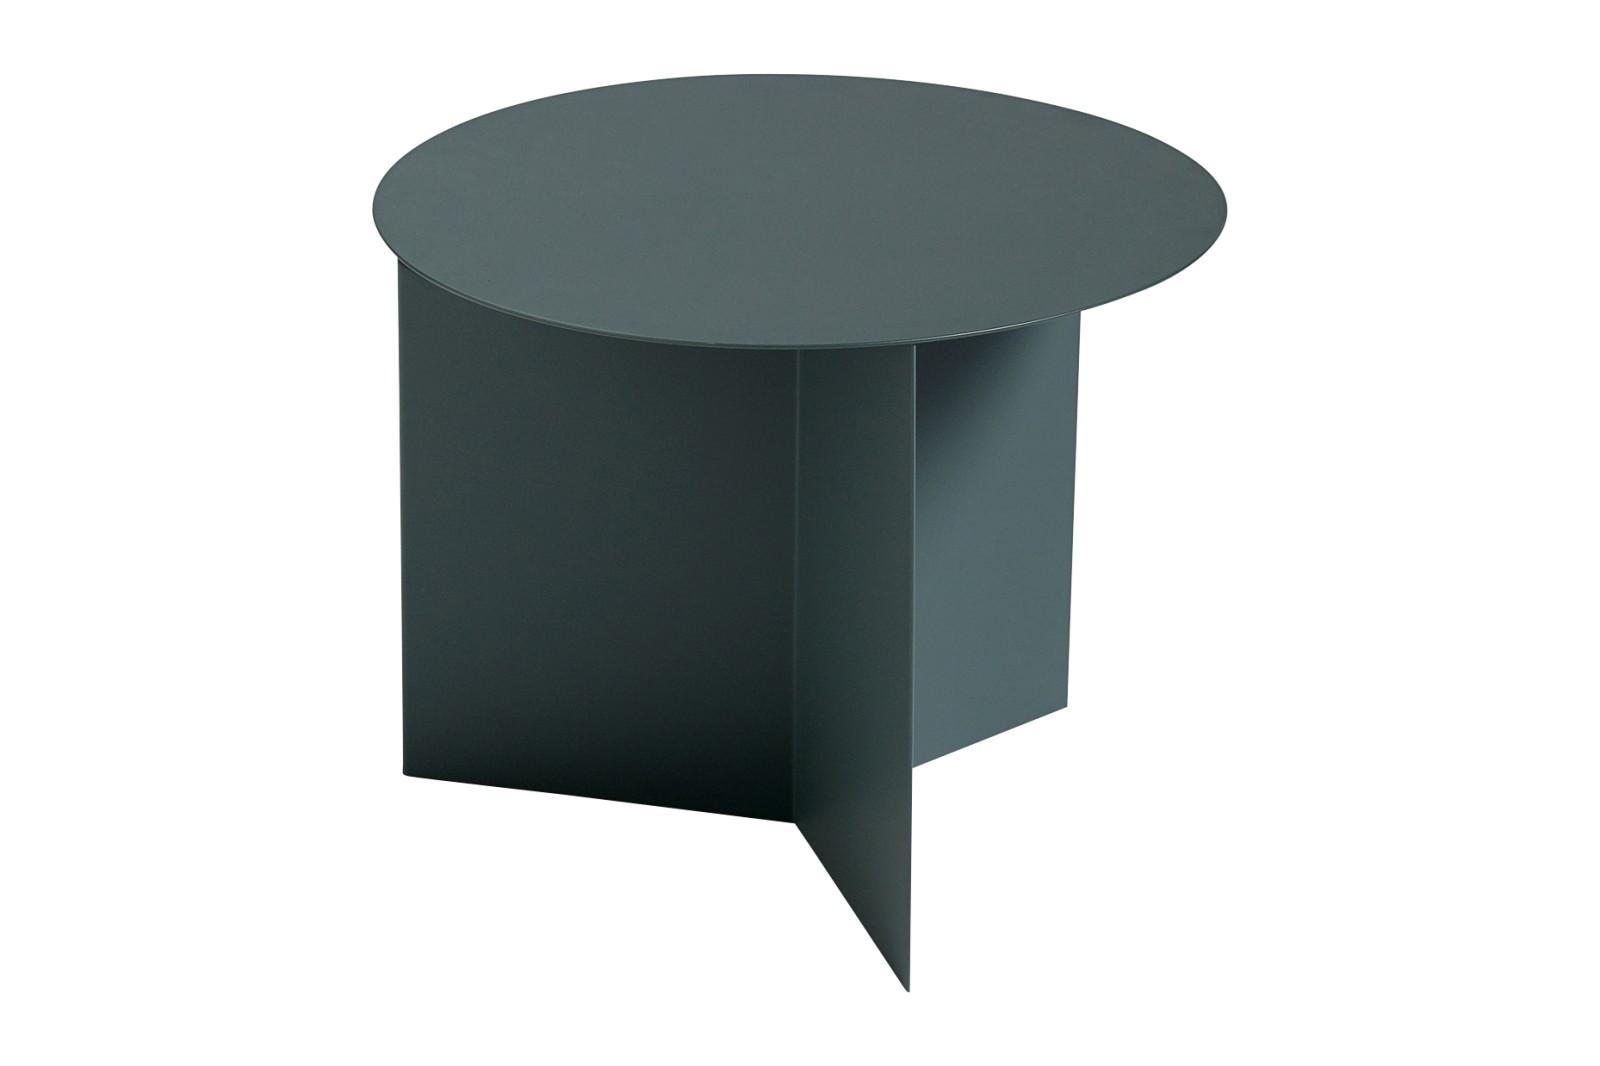 Slit Round Side Table Petrol grey, 045 cm